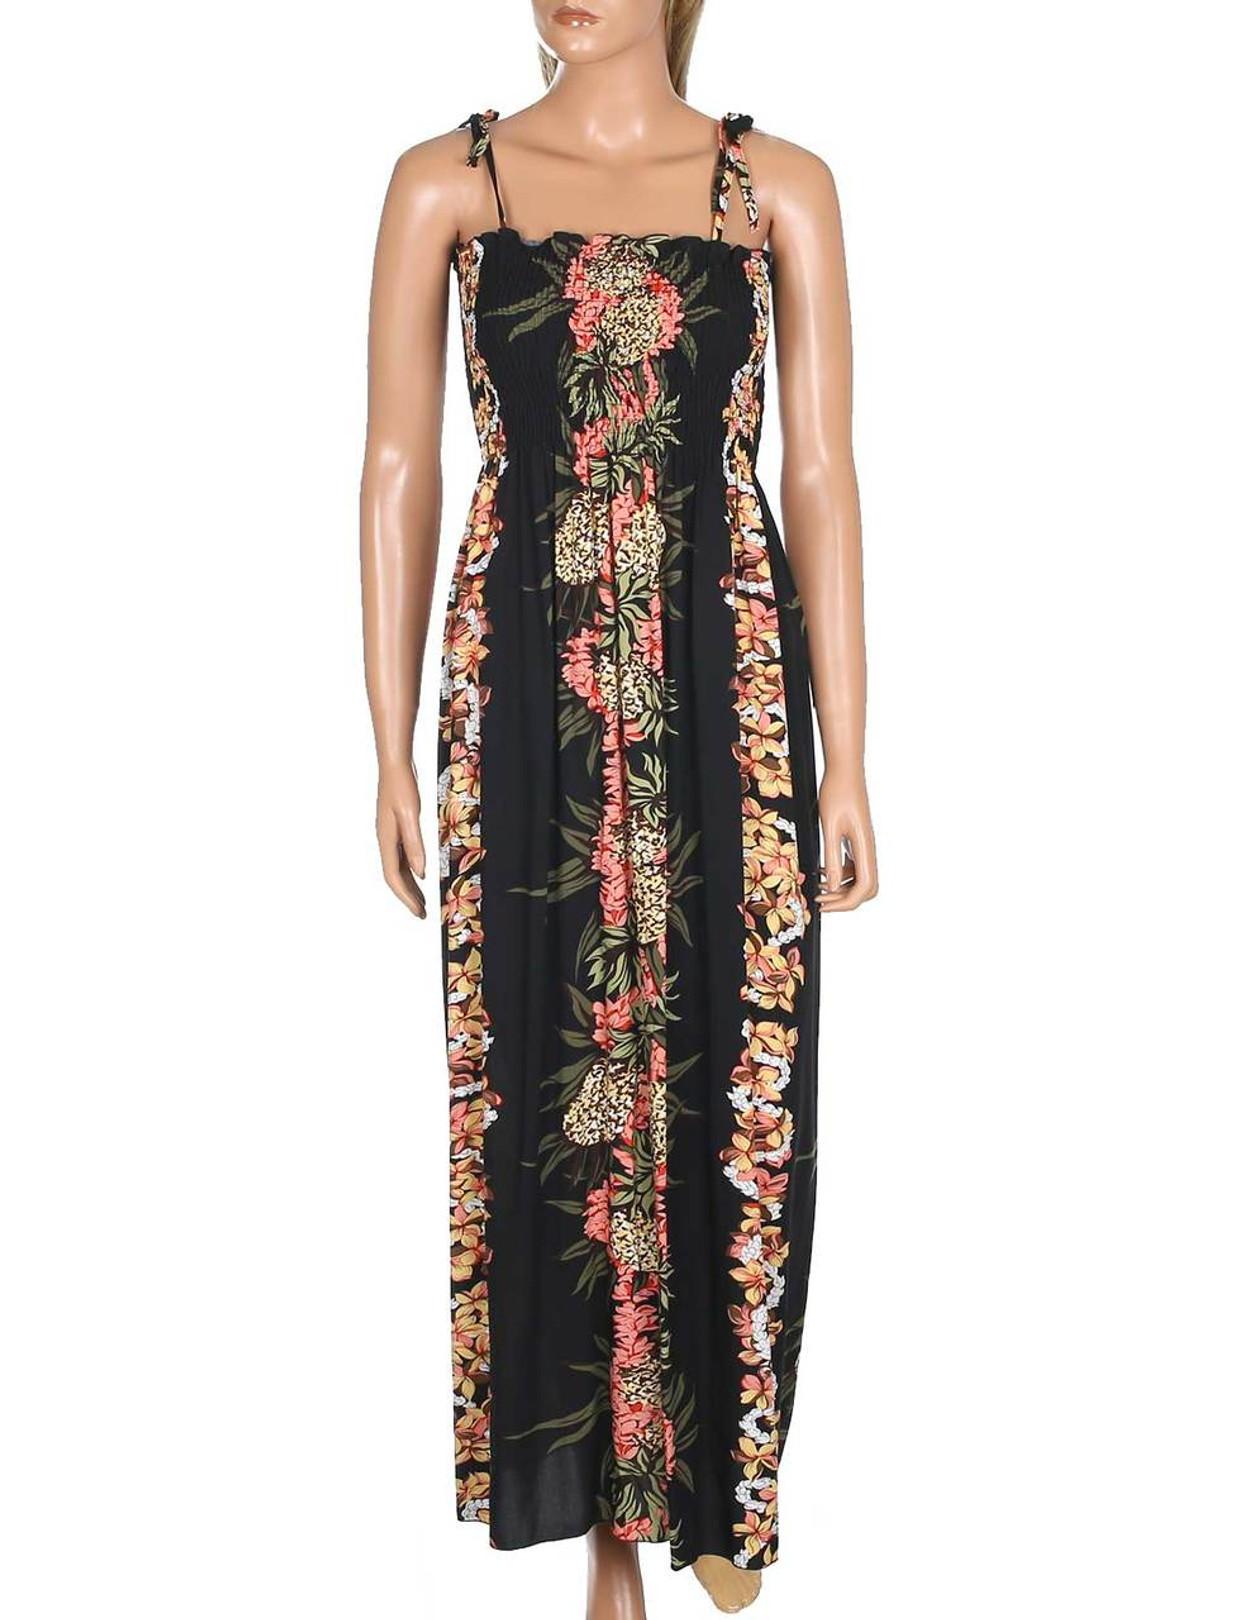 a1c0bf7aec Maxi Smock Dress Pineapple Panel 100% Rayon Fabric Long Maxi Smock Dress  Tie On Shoulder